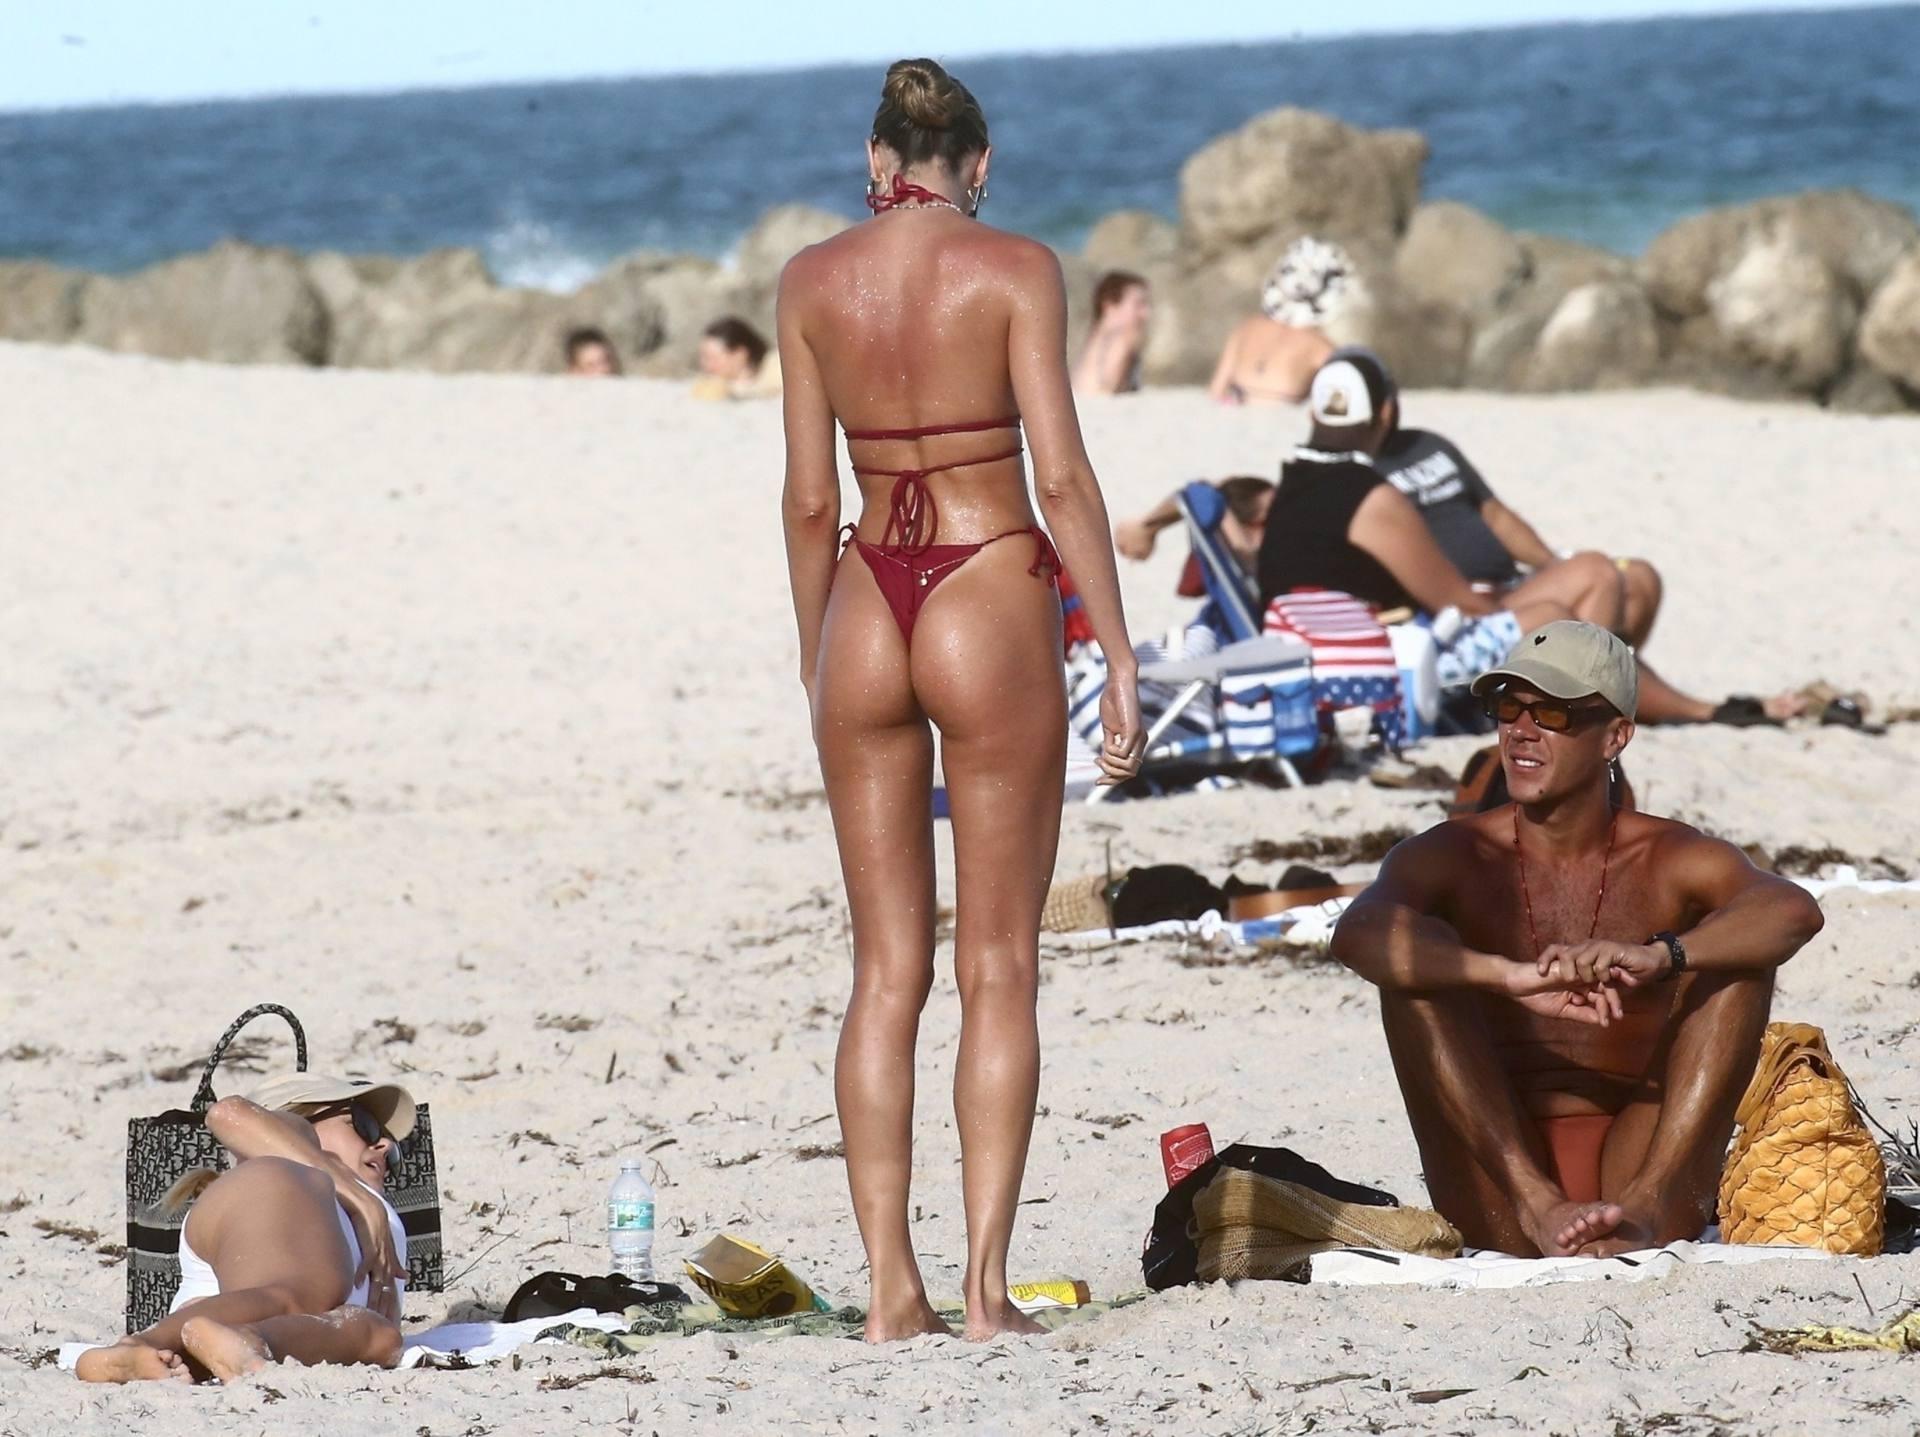 Candice Swanepoel Perfect Body